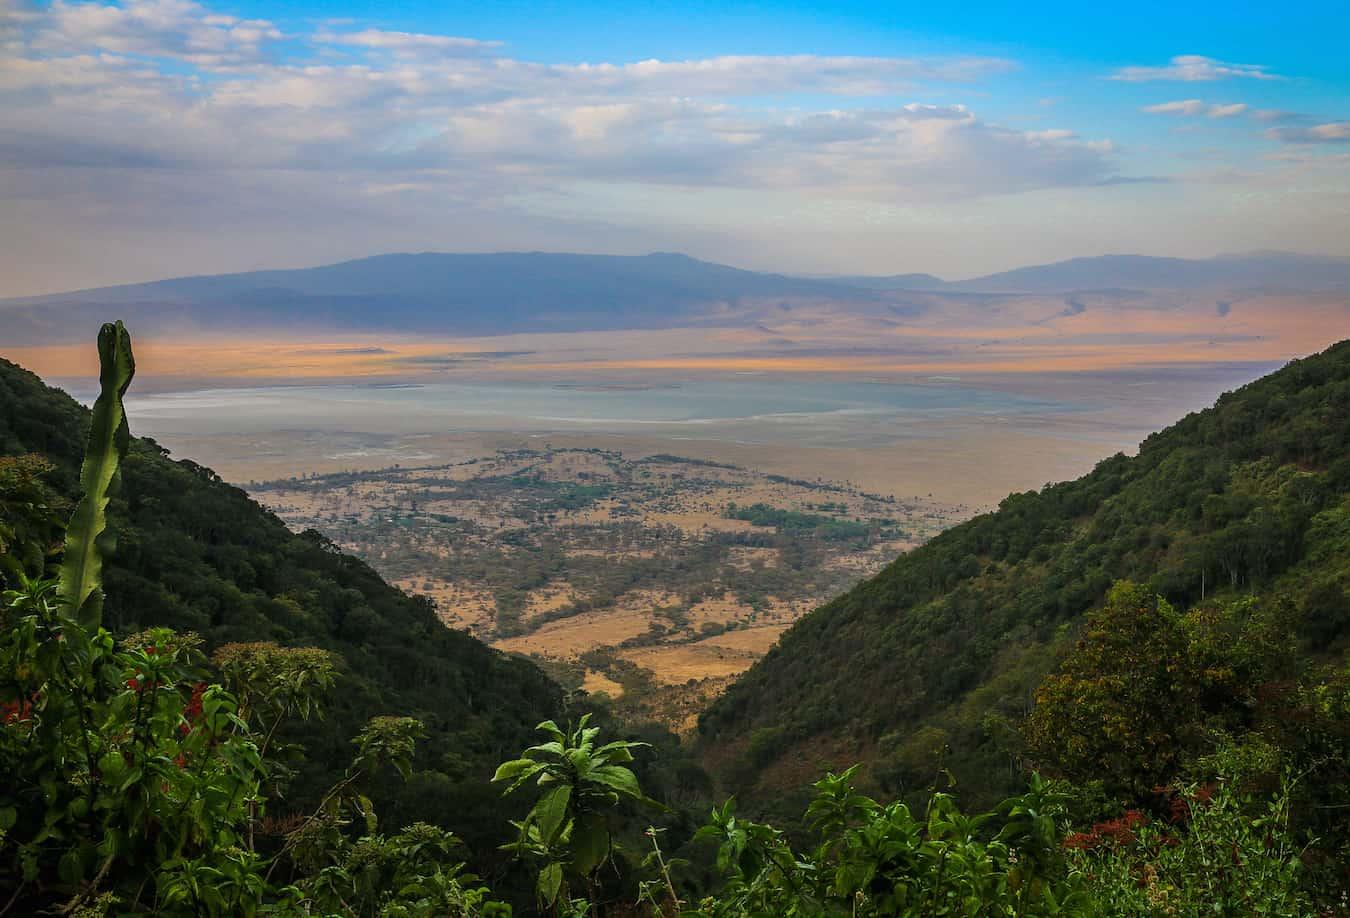 Sunset on Ngorongoro Crater, Tanzania